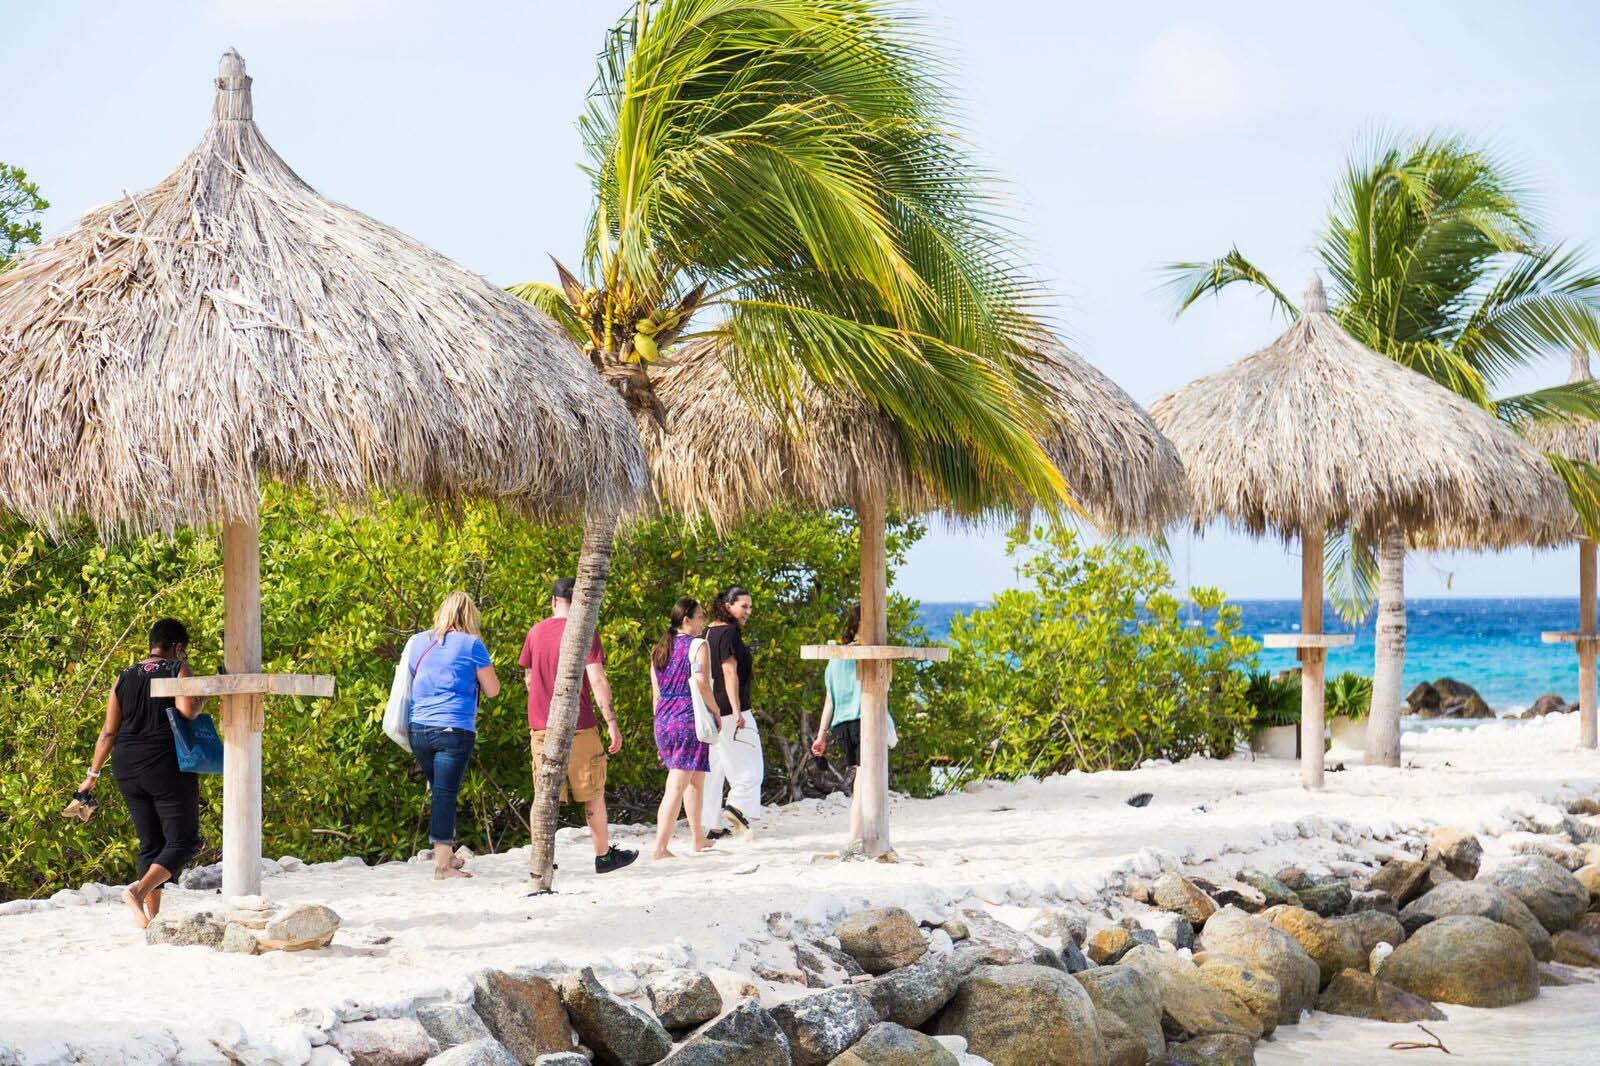 Aruba_Renaissance_Island_2.jpeg